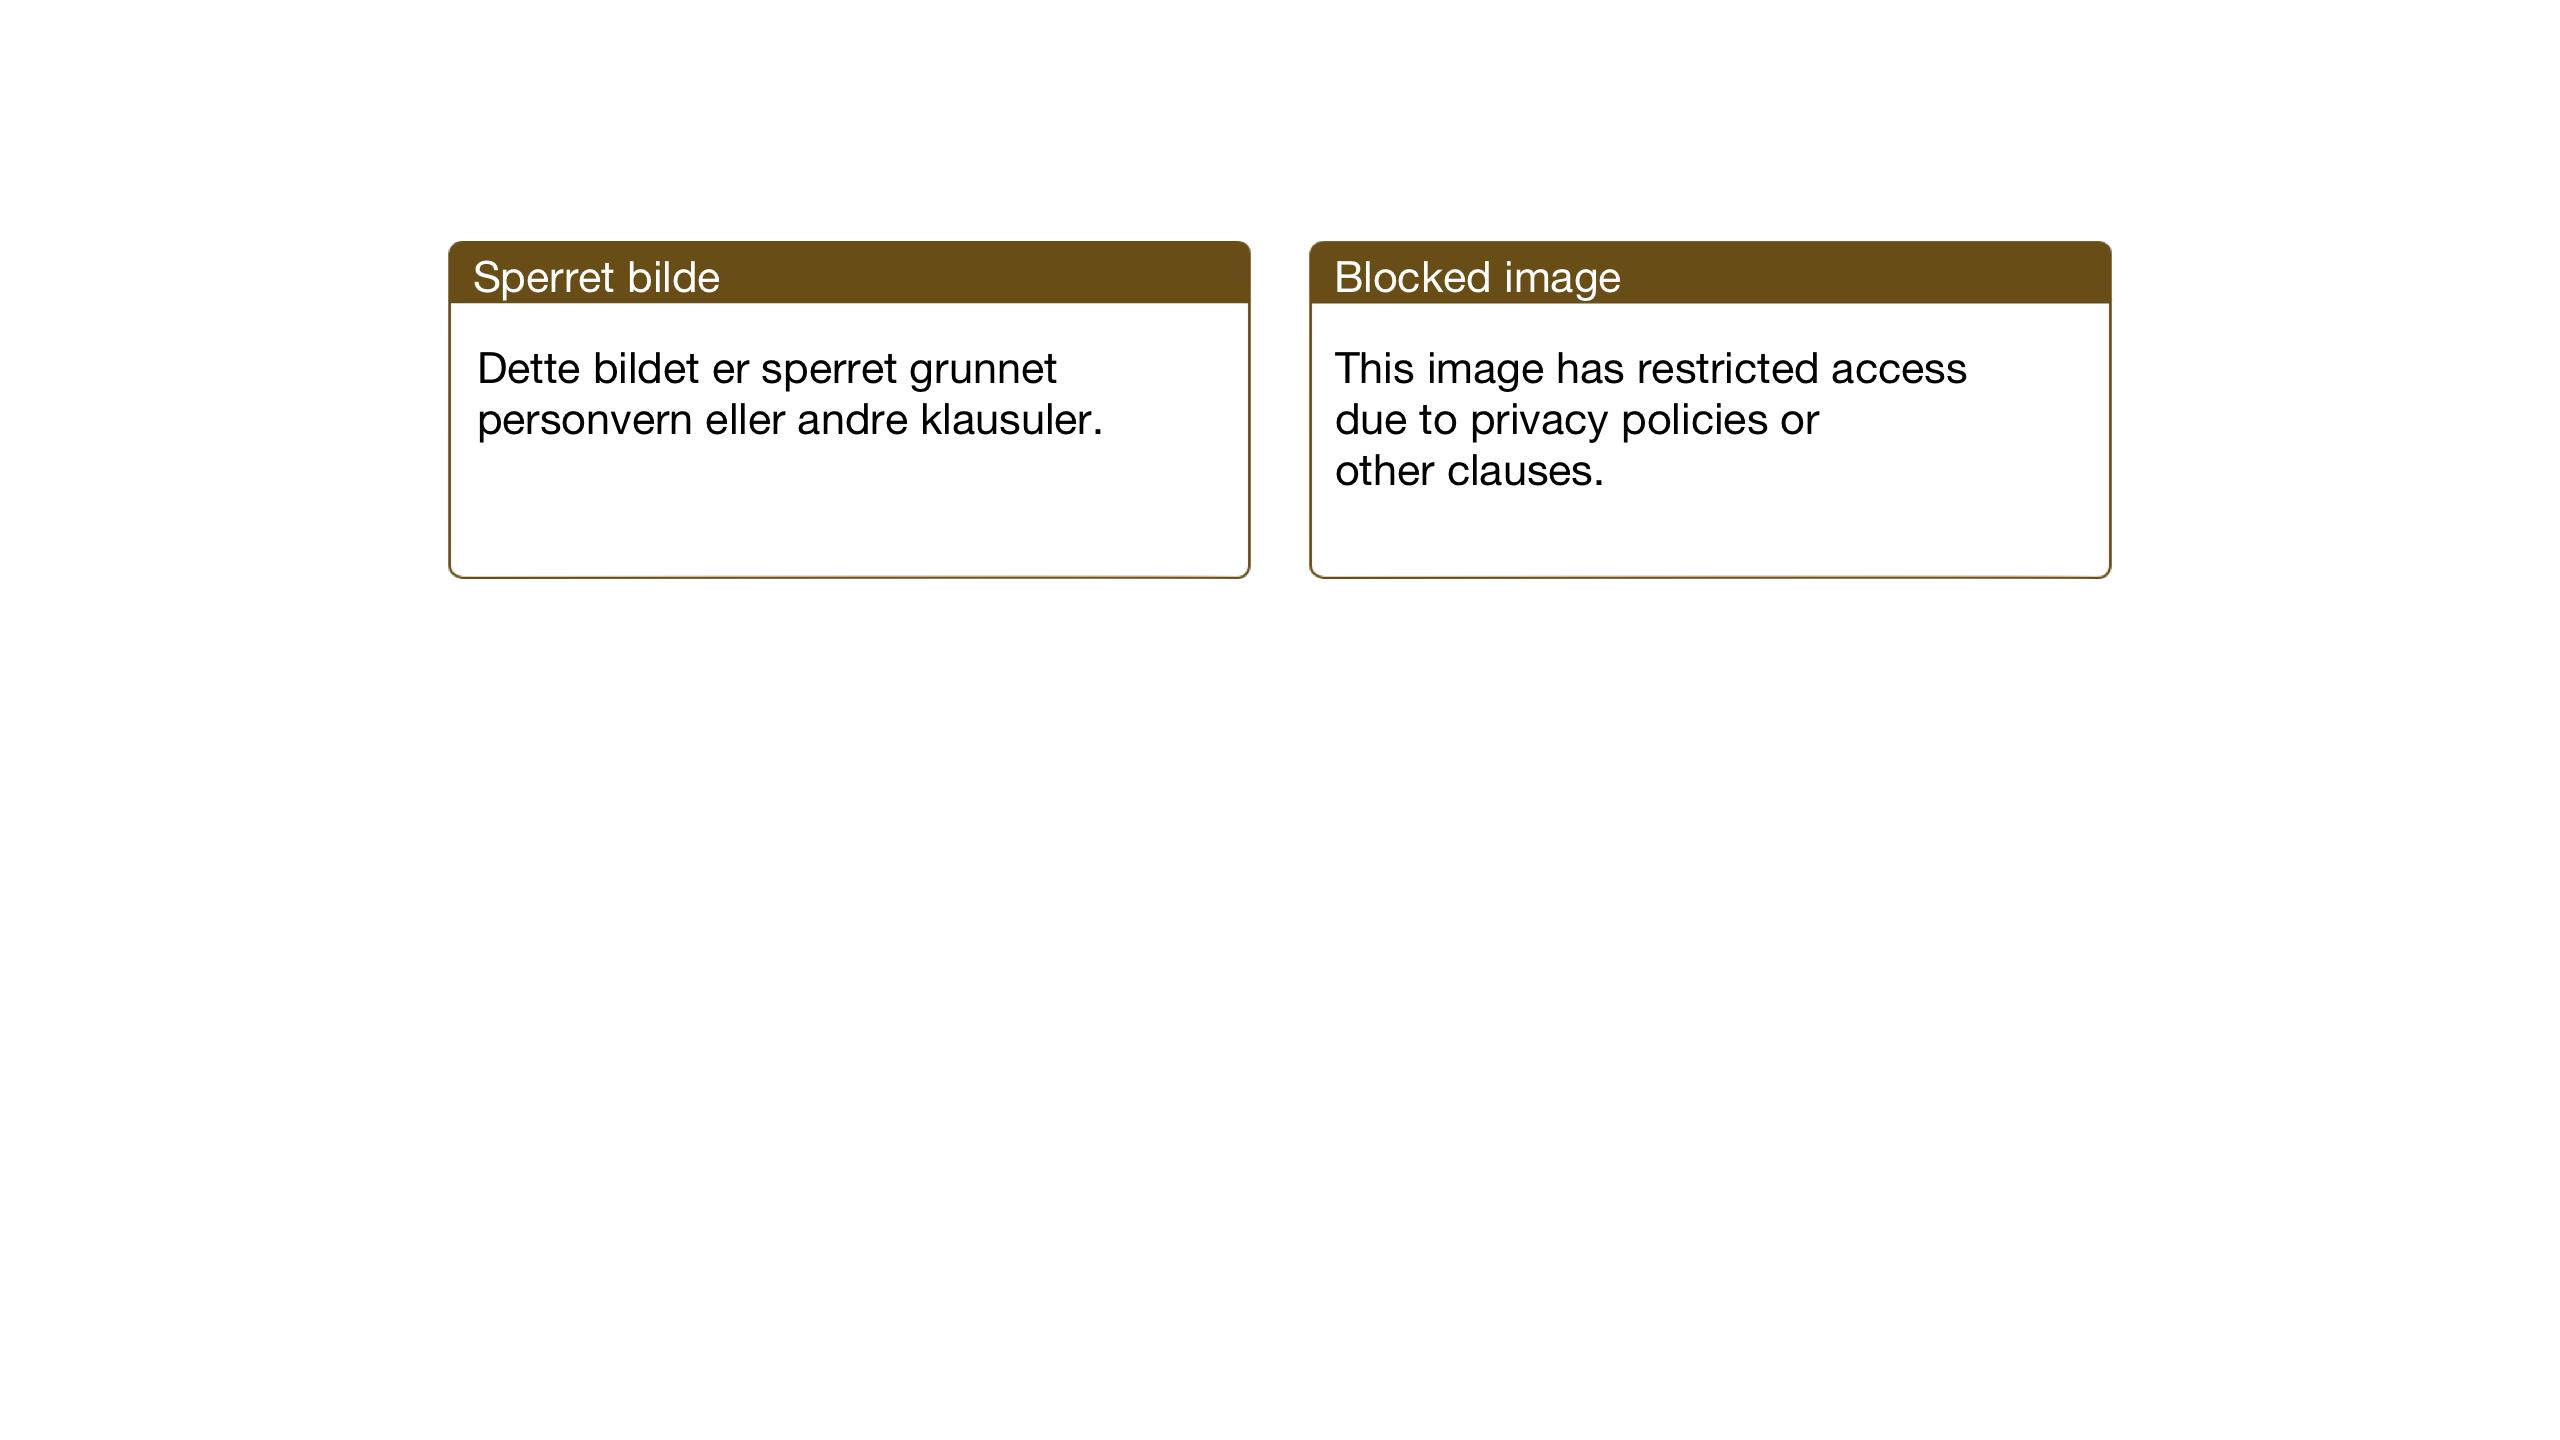 SAT, Ministerialprotokoller, klokkerbøker og fødselsregistre - Nordland, 847/L0680: Klokkerbok nr. 847C08, 1930-1947, s. 115